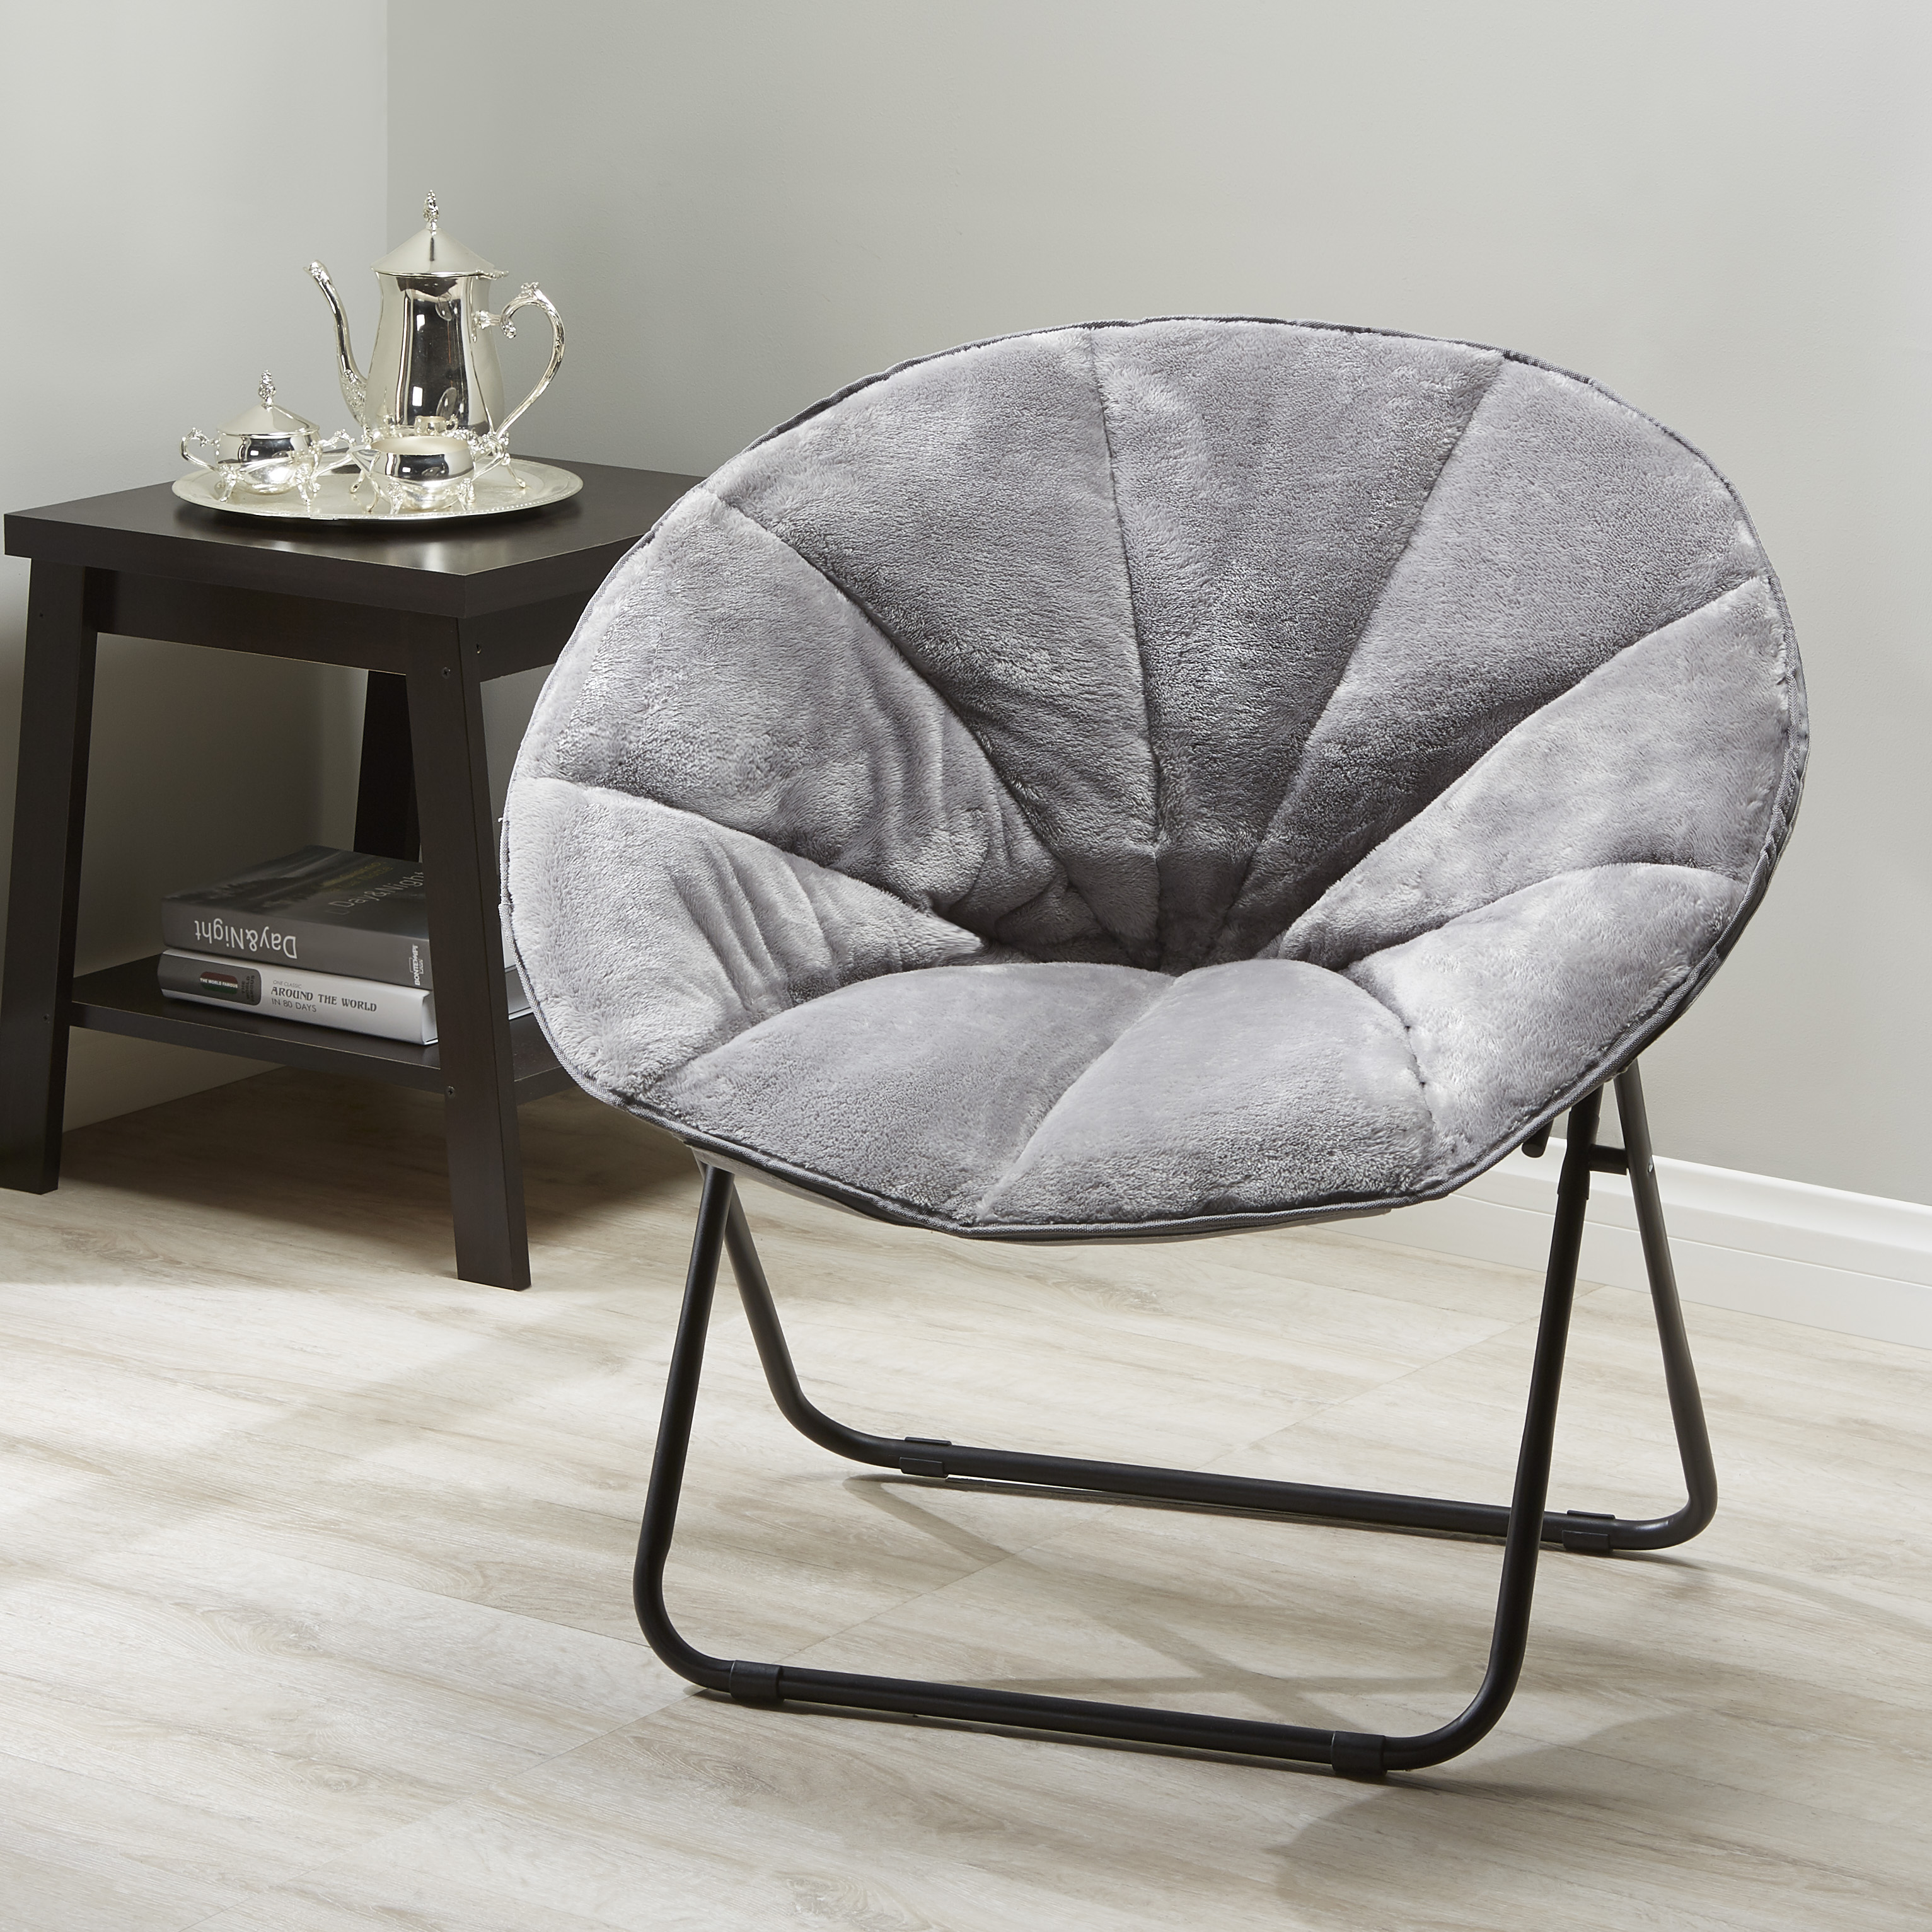 saucer chairs sam s club shop on wheels mainstays folding plush chair multiple colors walmart com